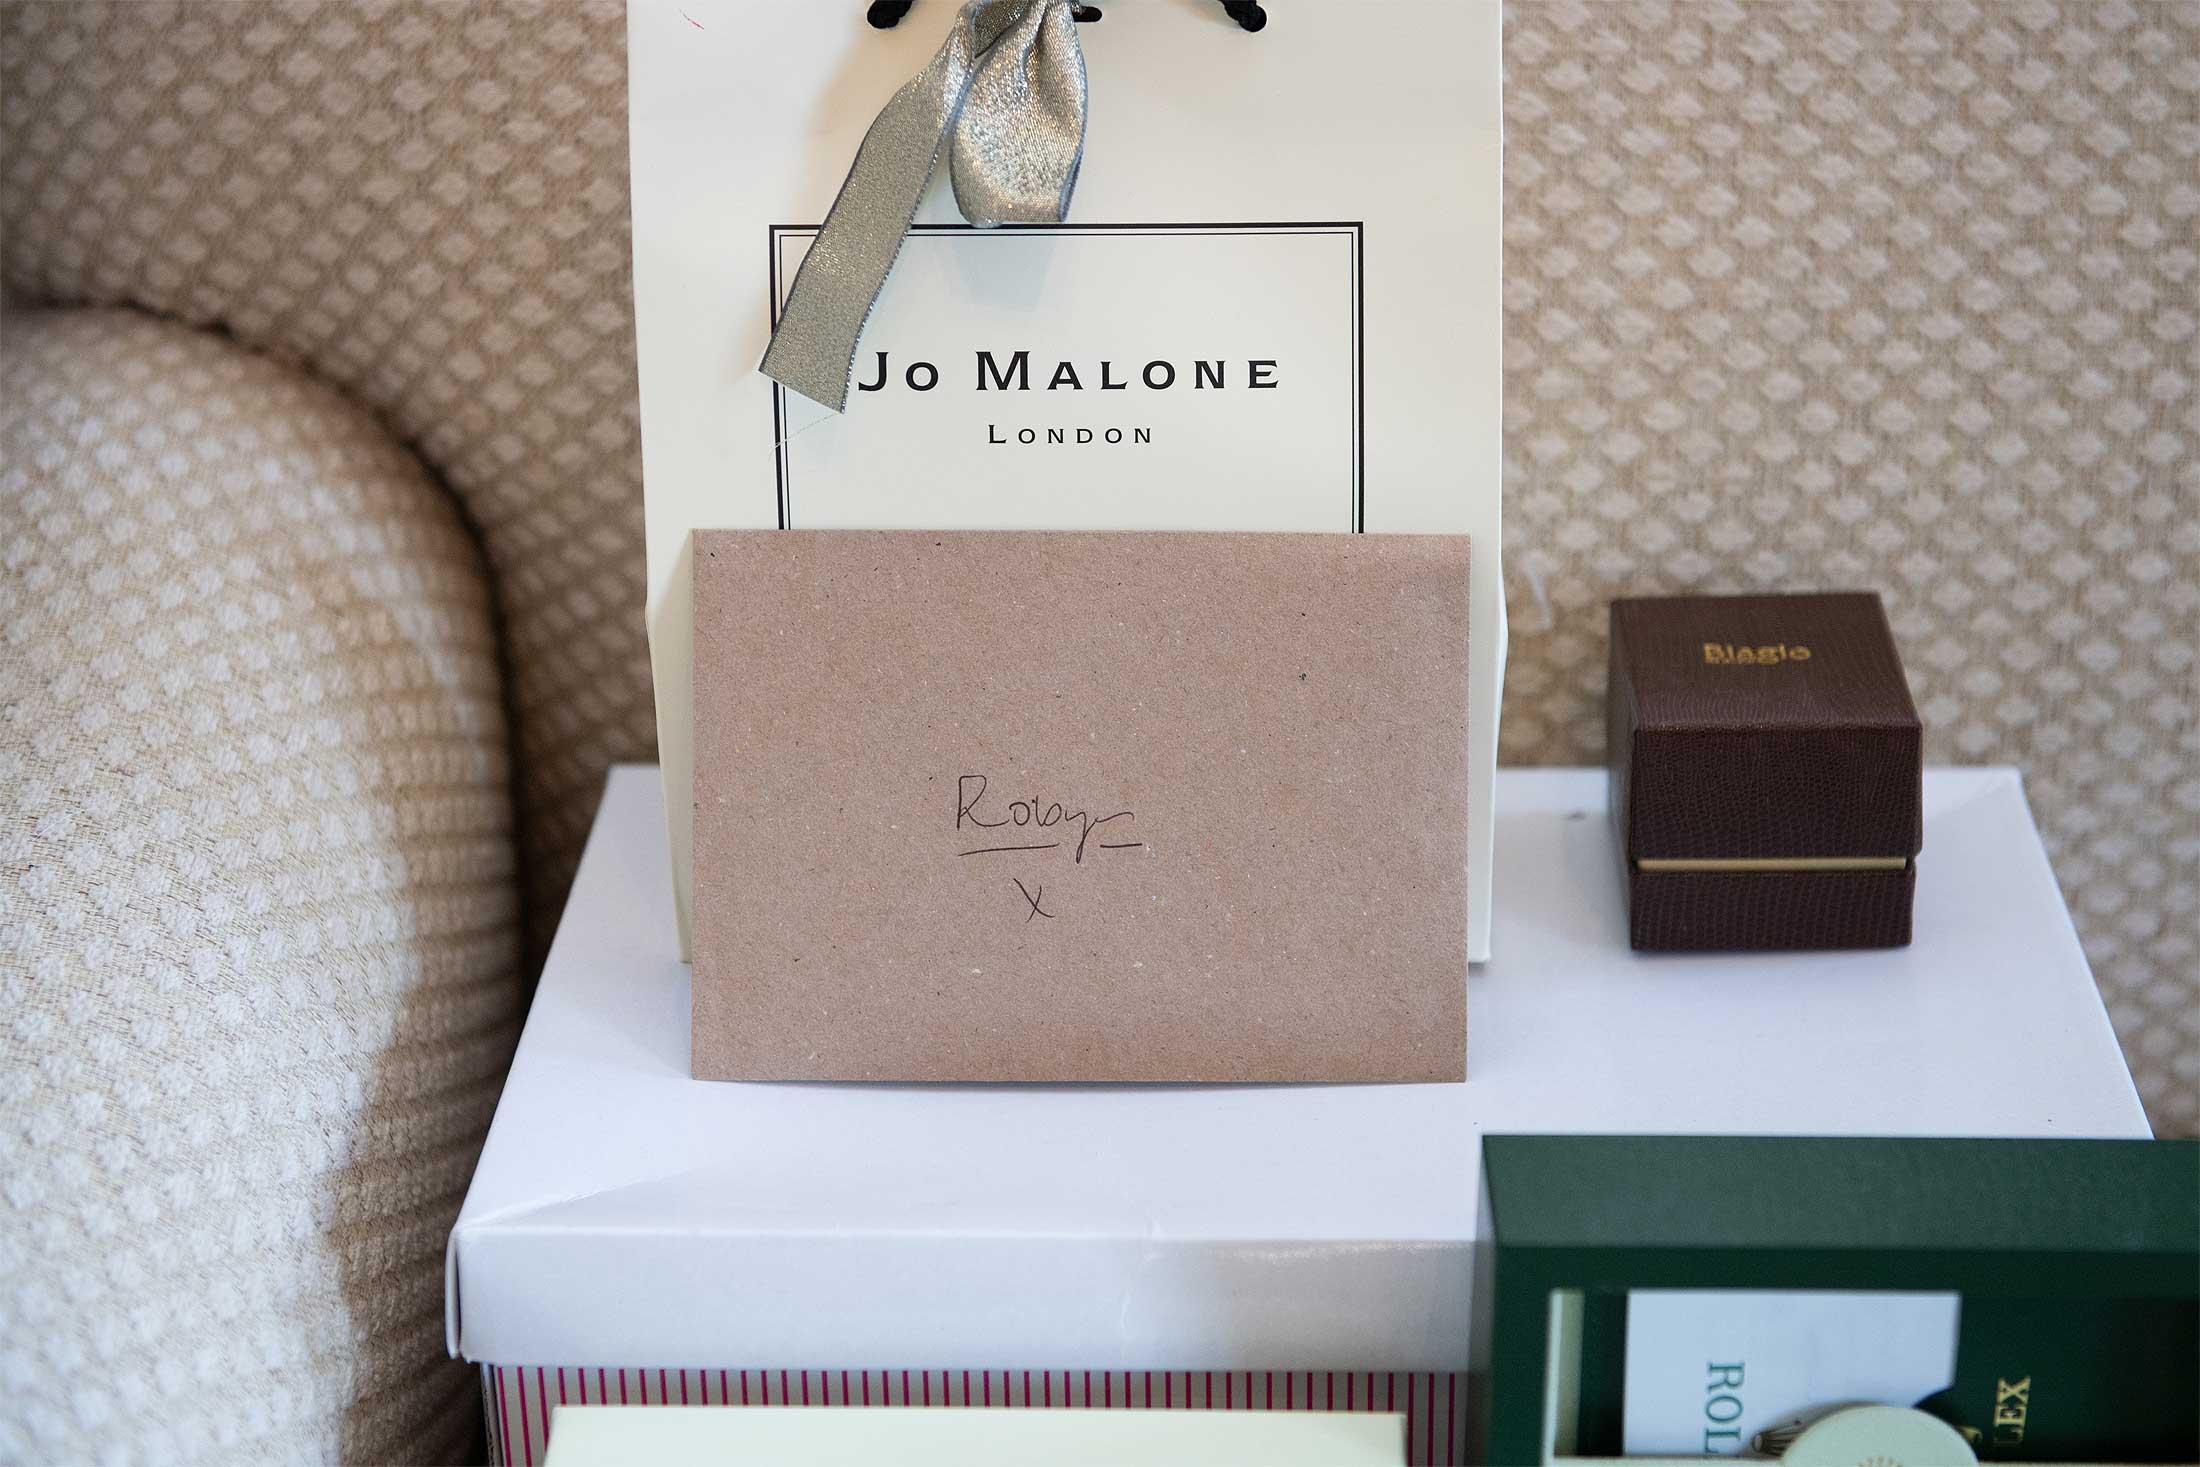 wedding gifts jo malone and rolex